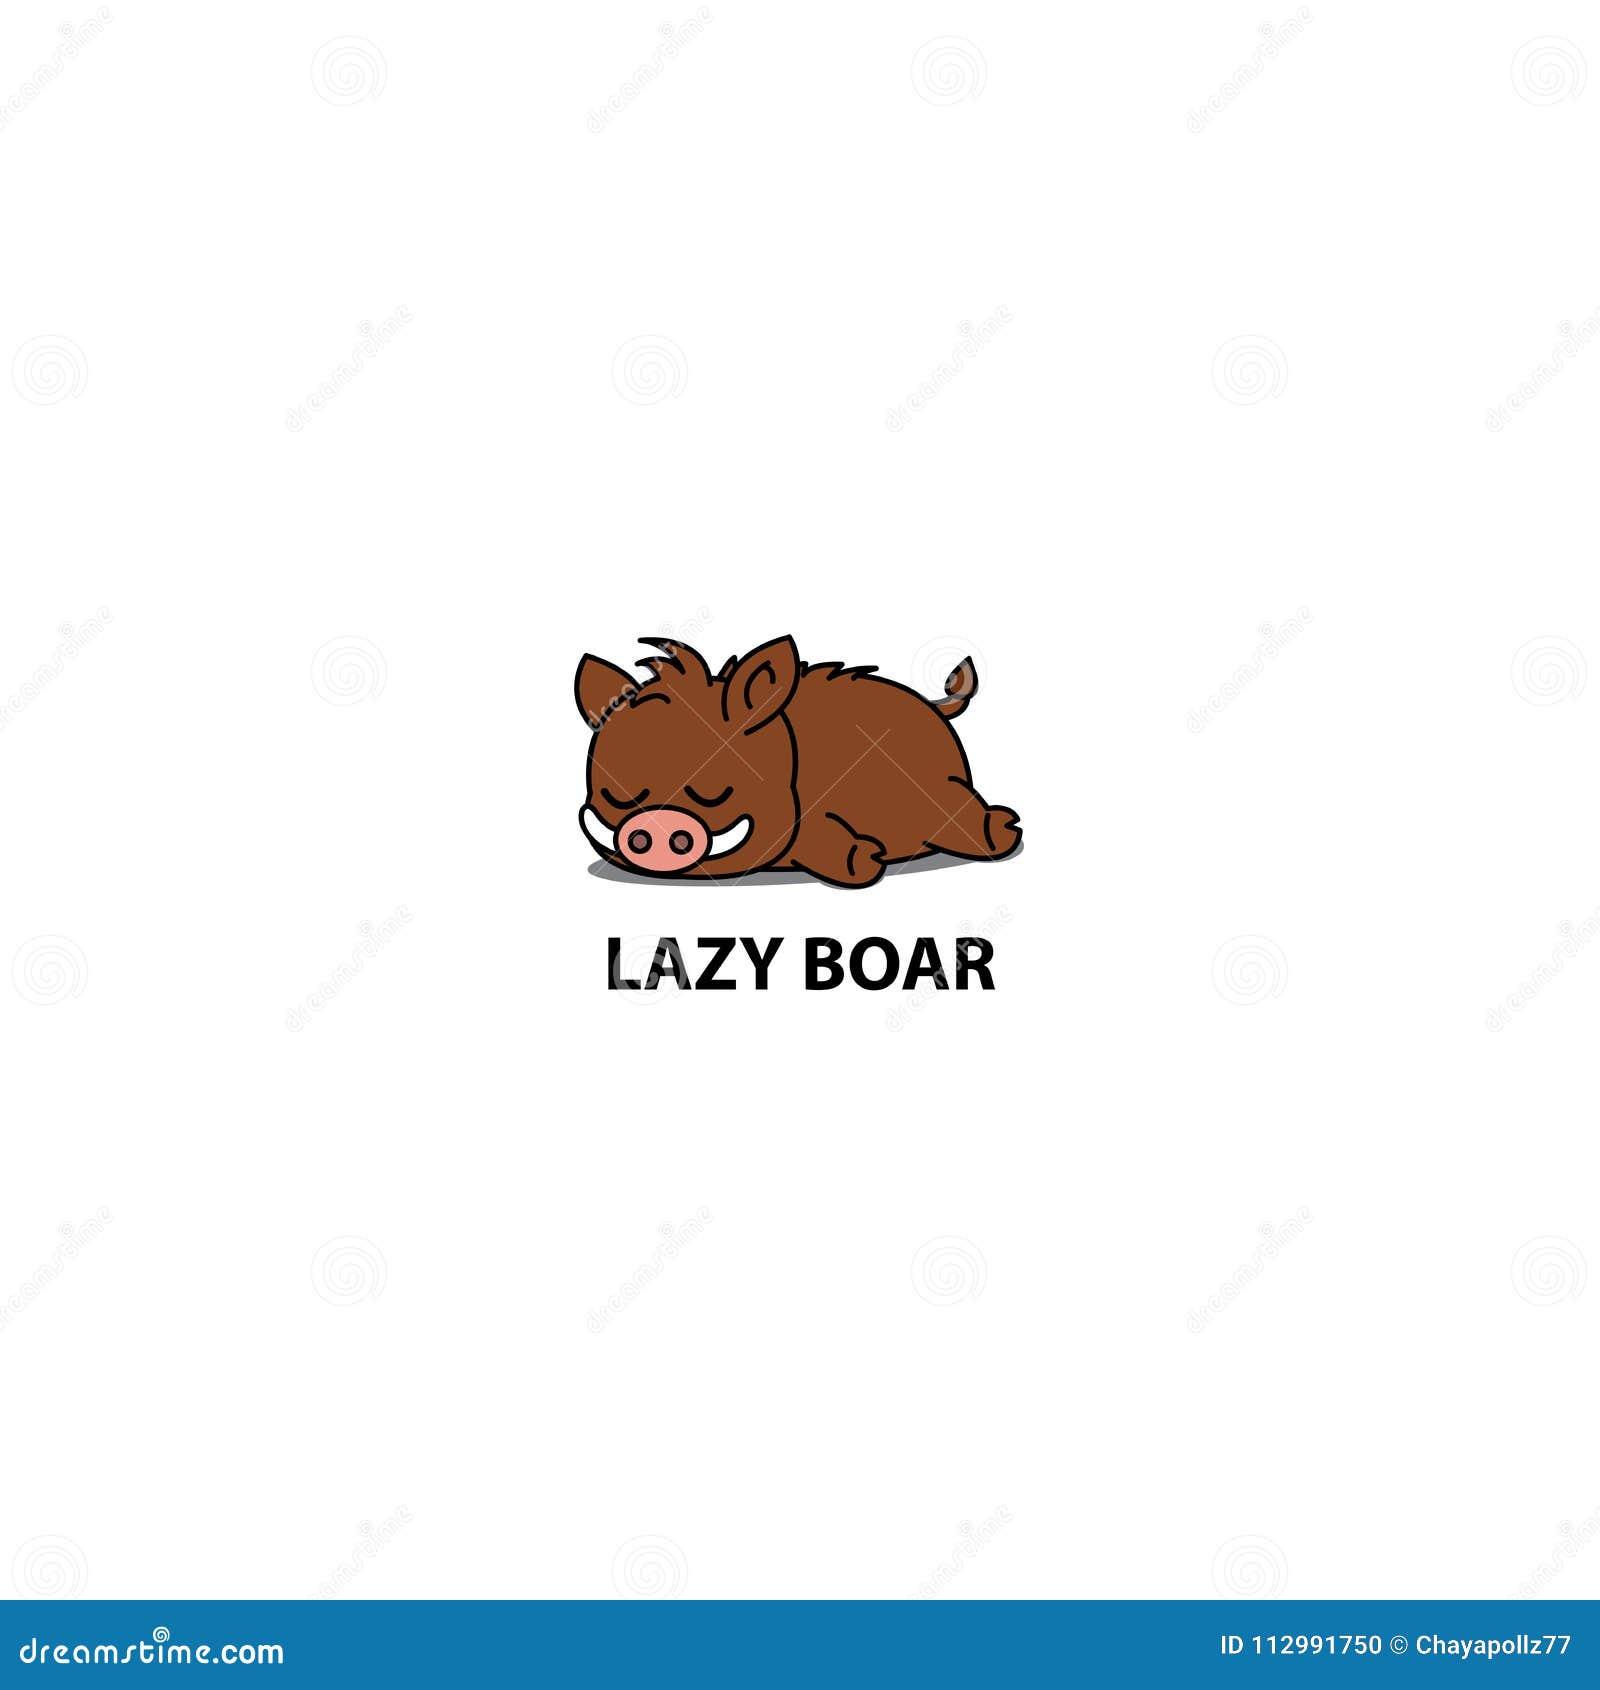 Lazy boar icon, logo design, vector